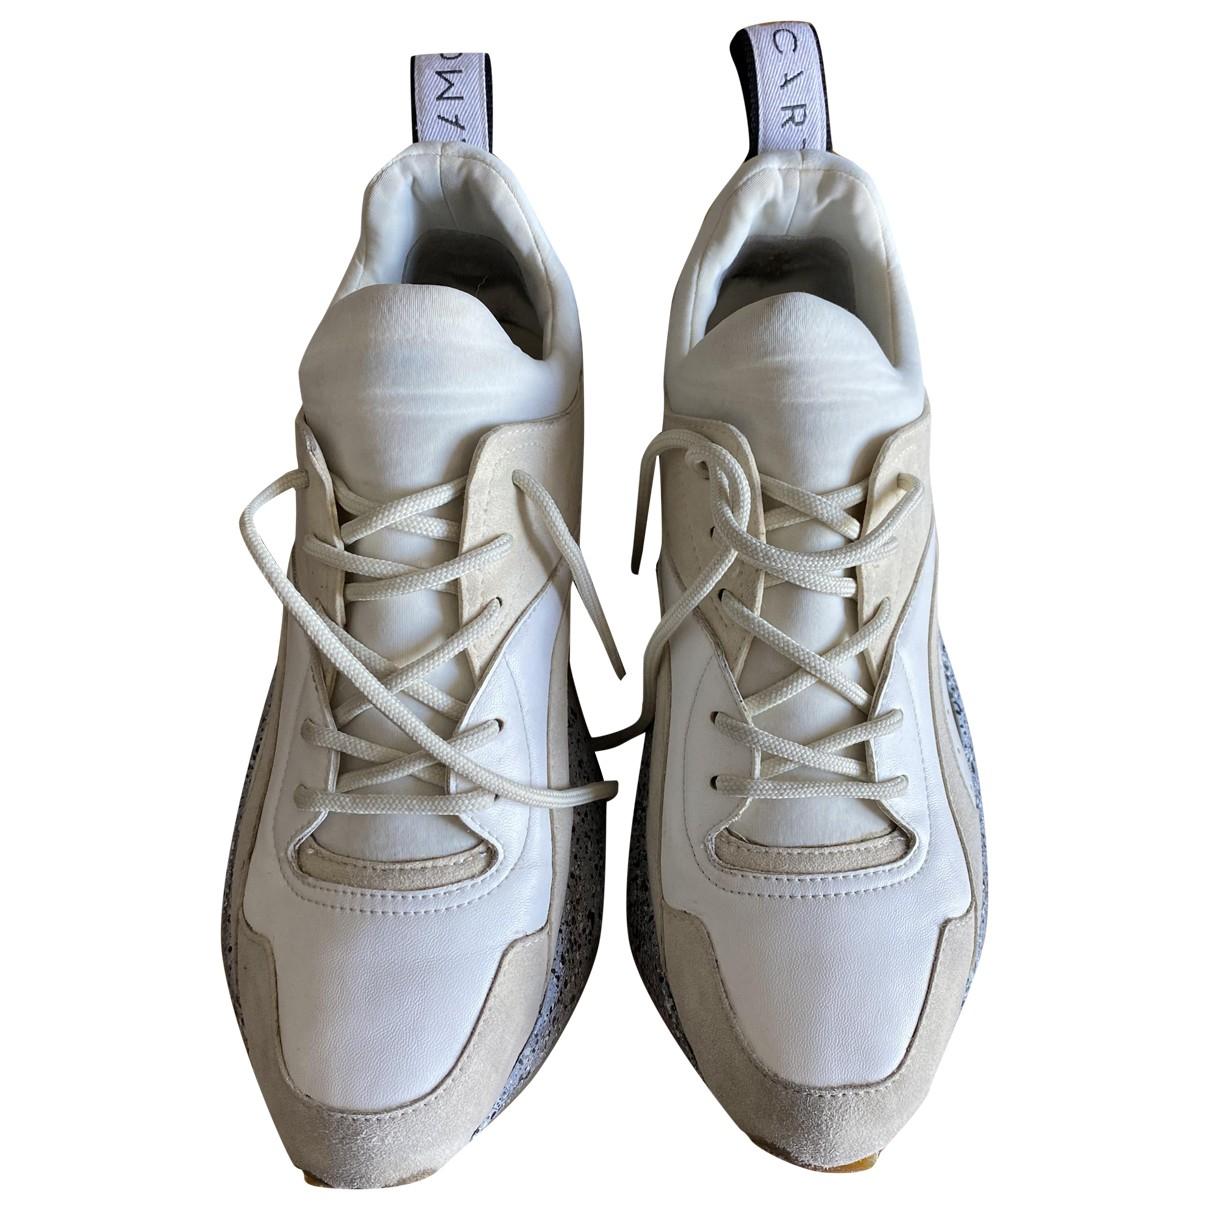 Stella Mccartney Eclypse White Leather Trainers for Women 40 EU